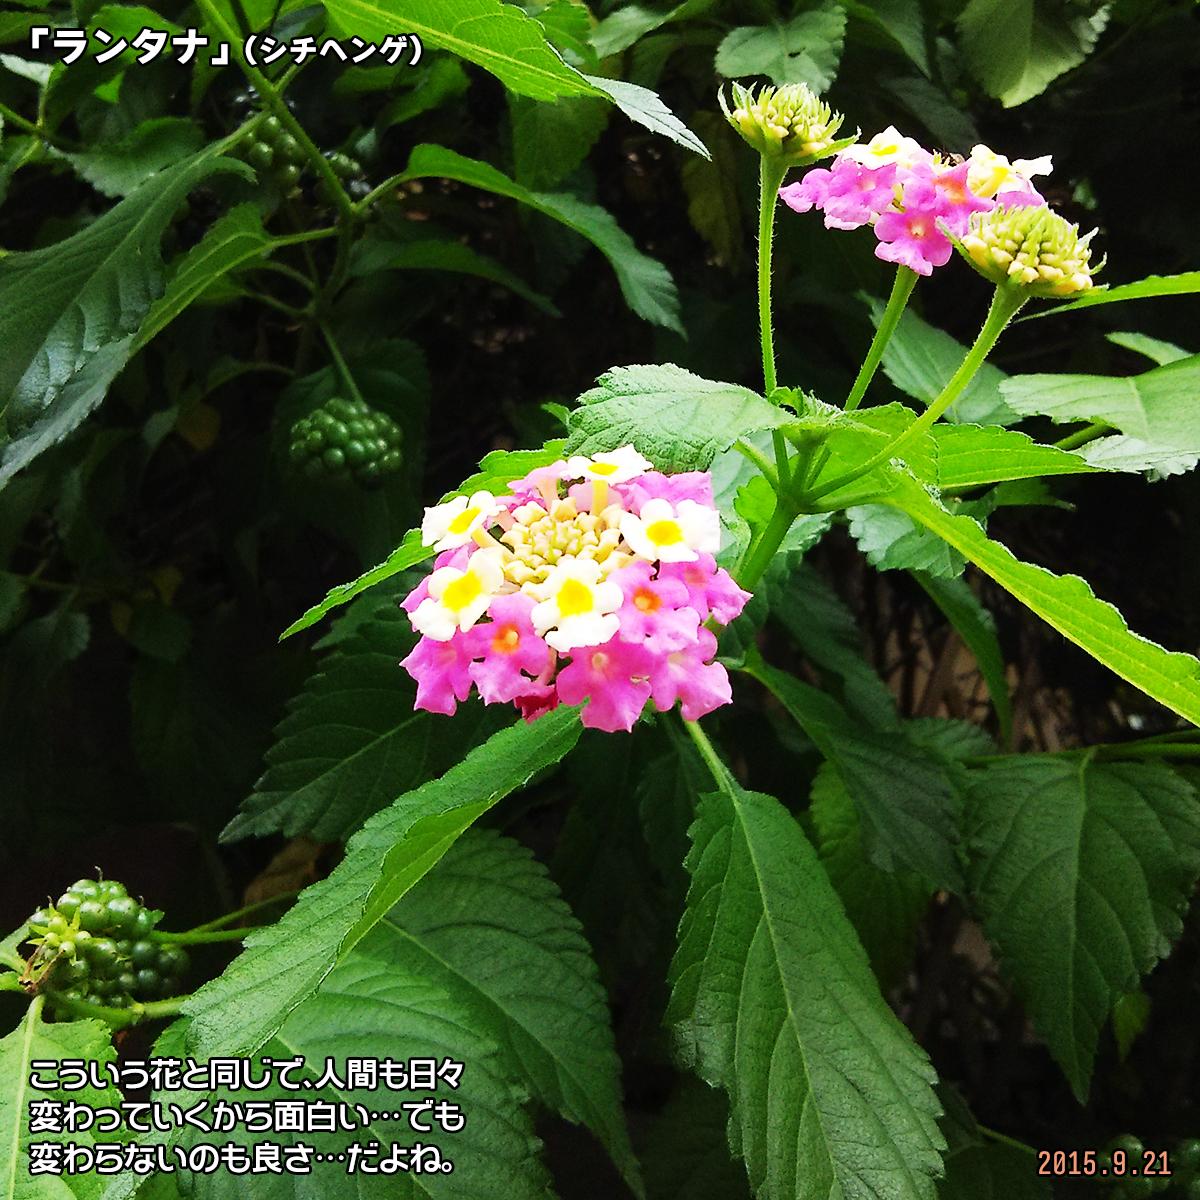 DSC_1136_20180323173827062.jpg